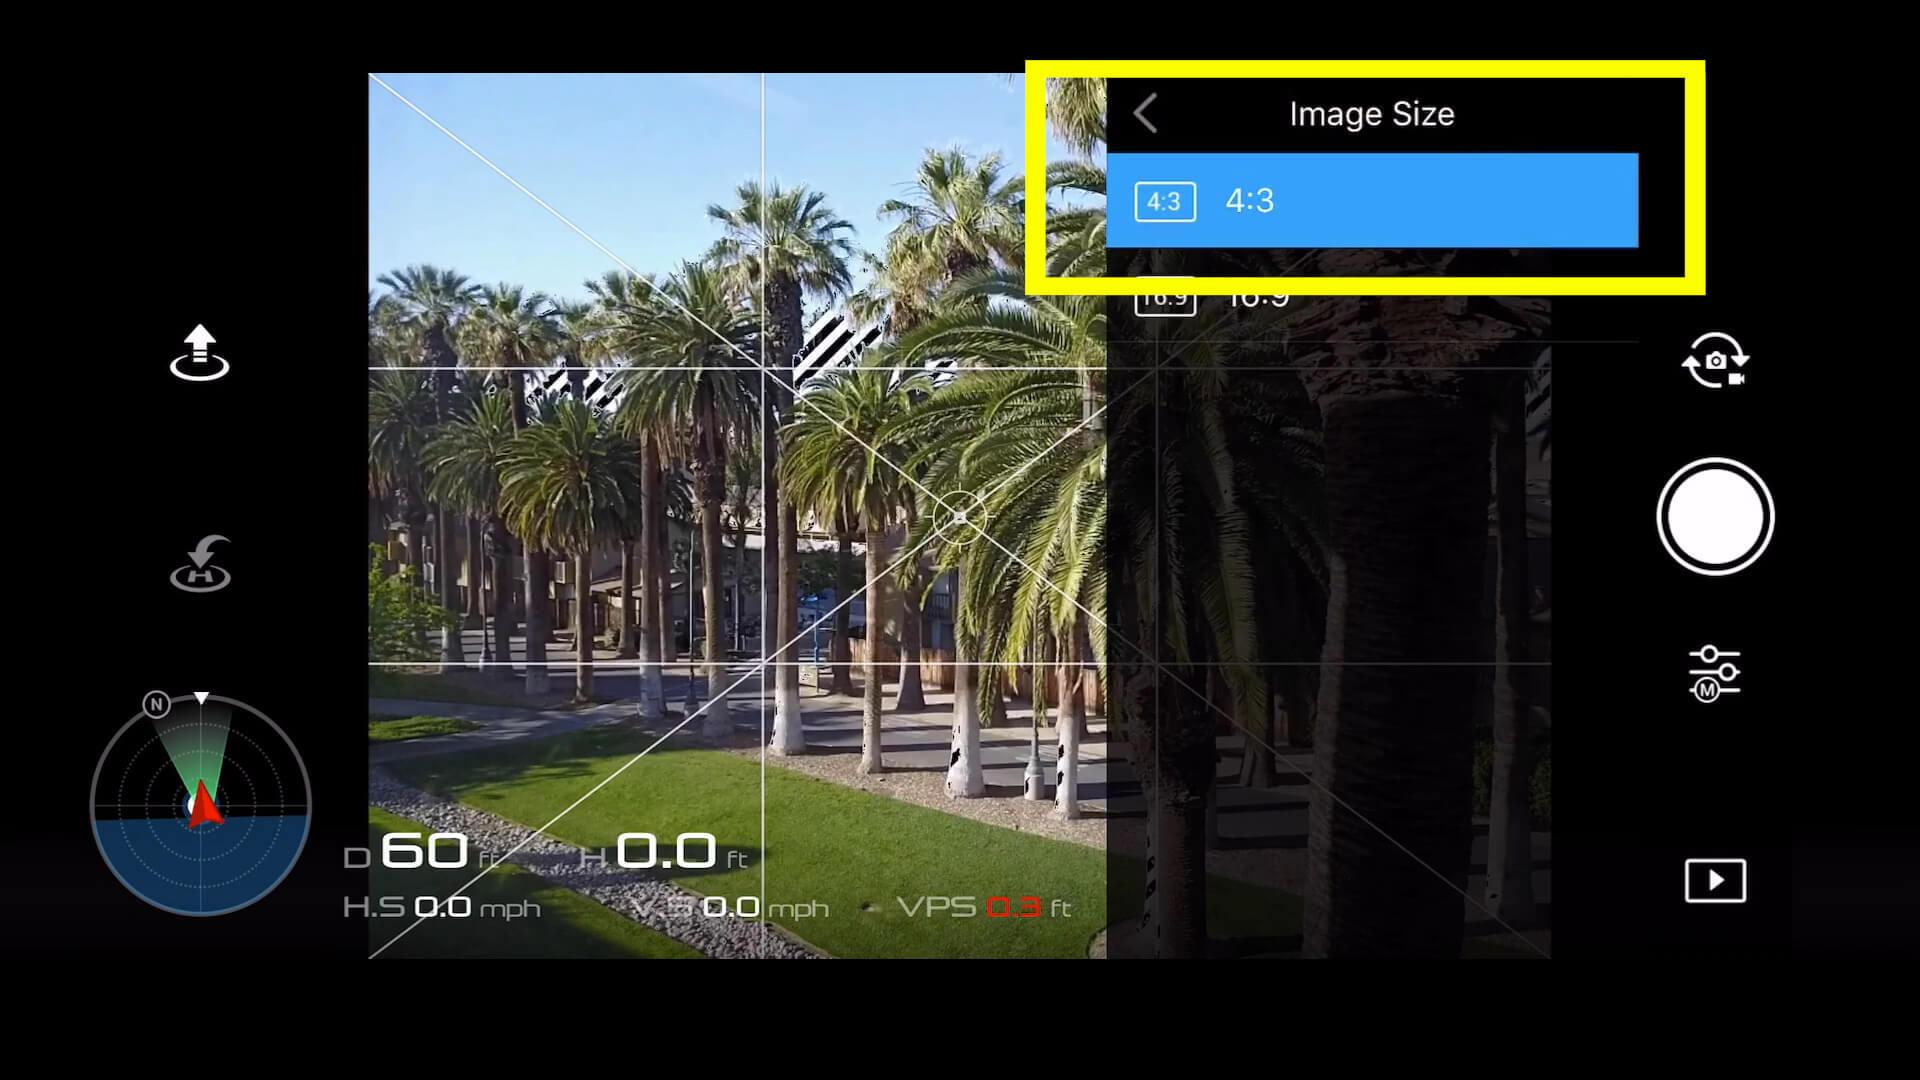 21 basic camera settings for dji drone photos - image size